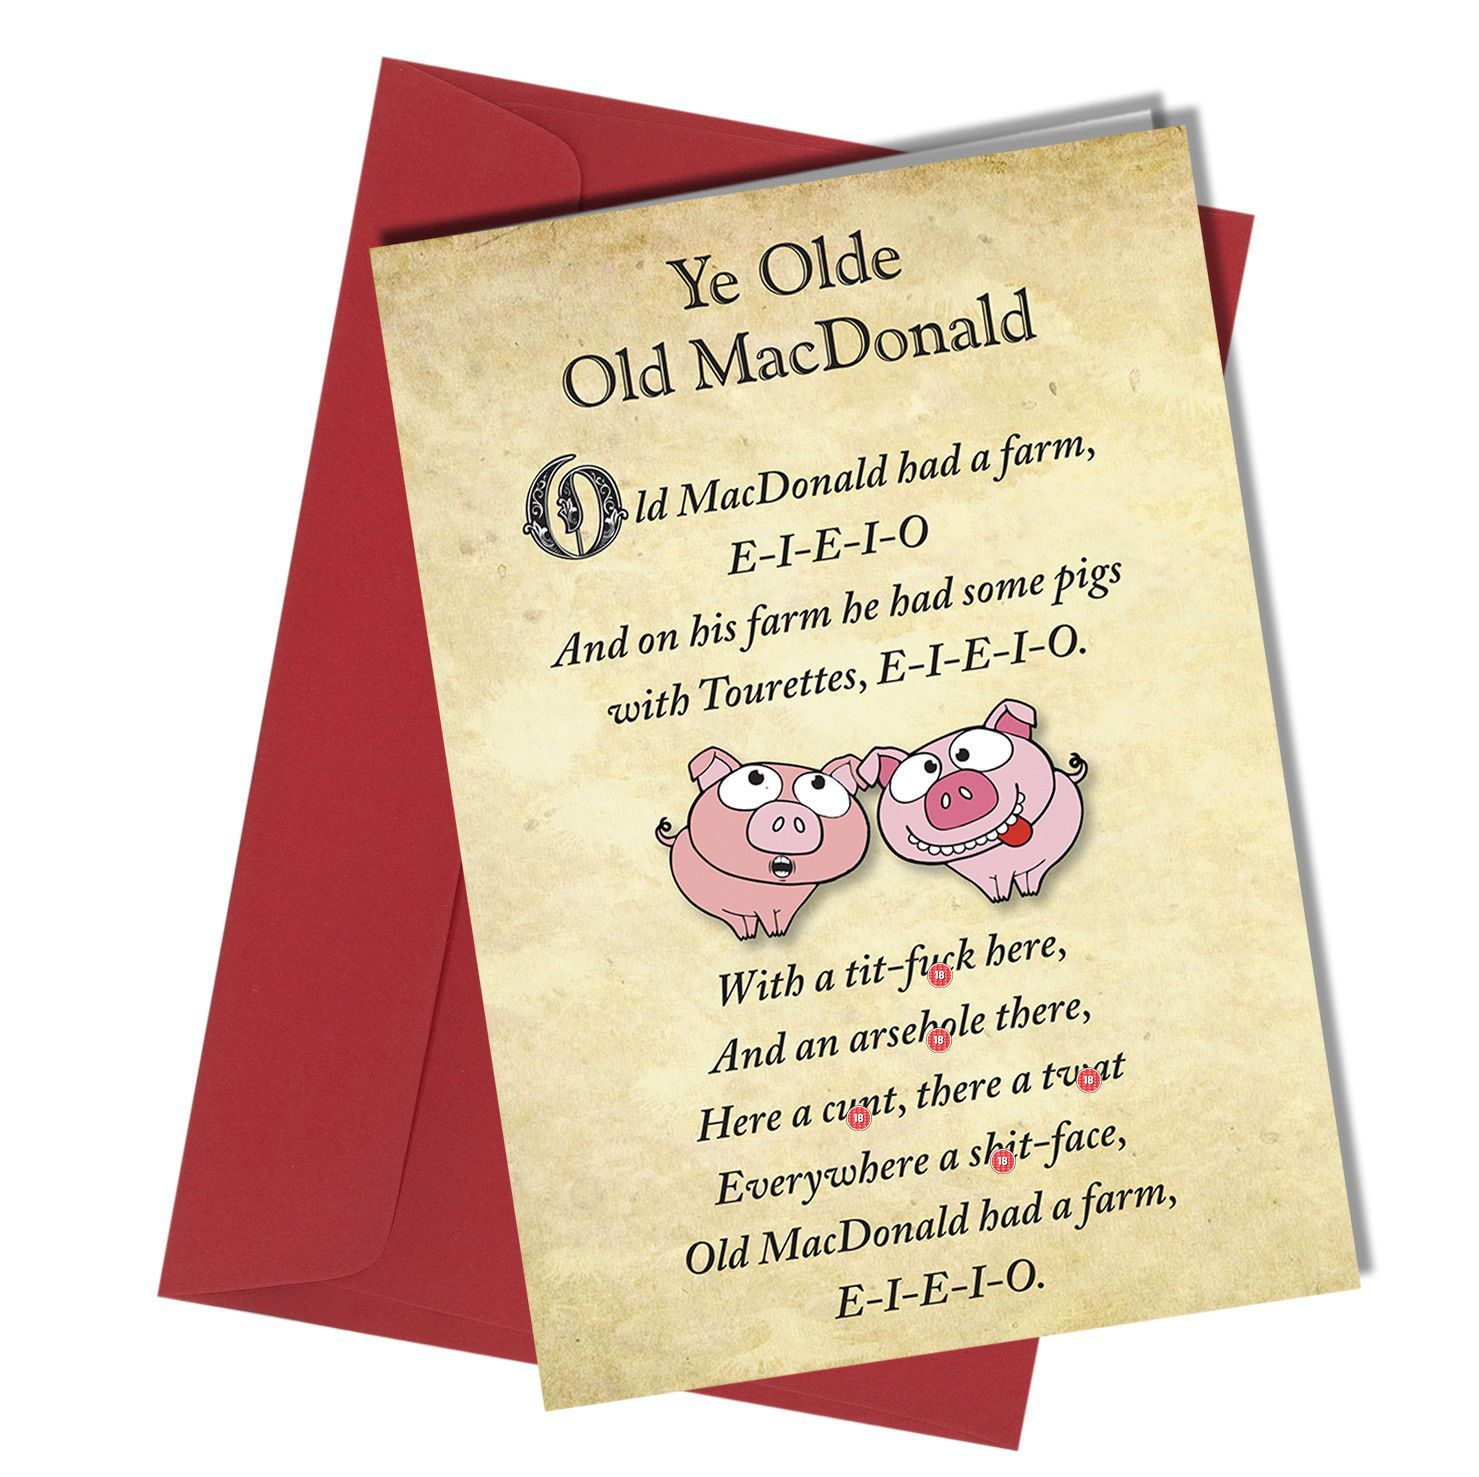 #563 Old MacDonald